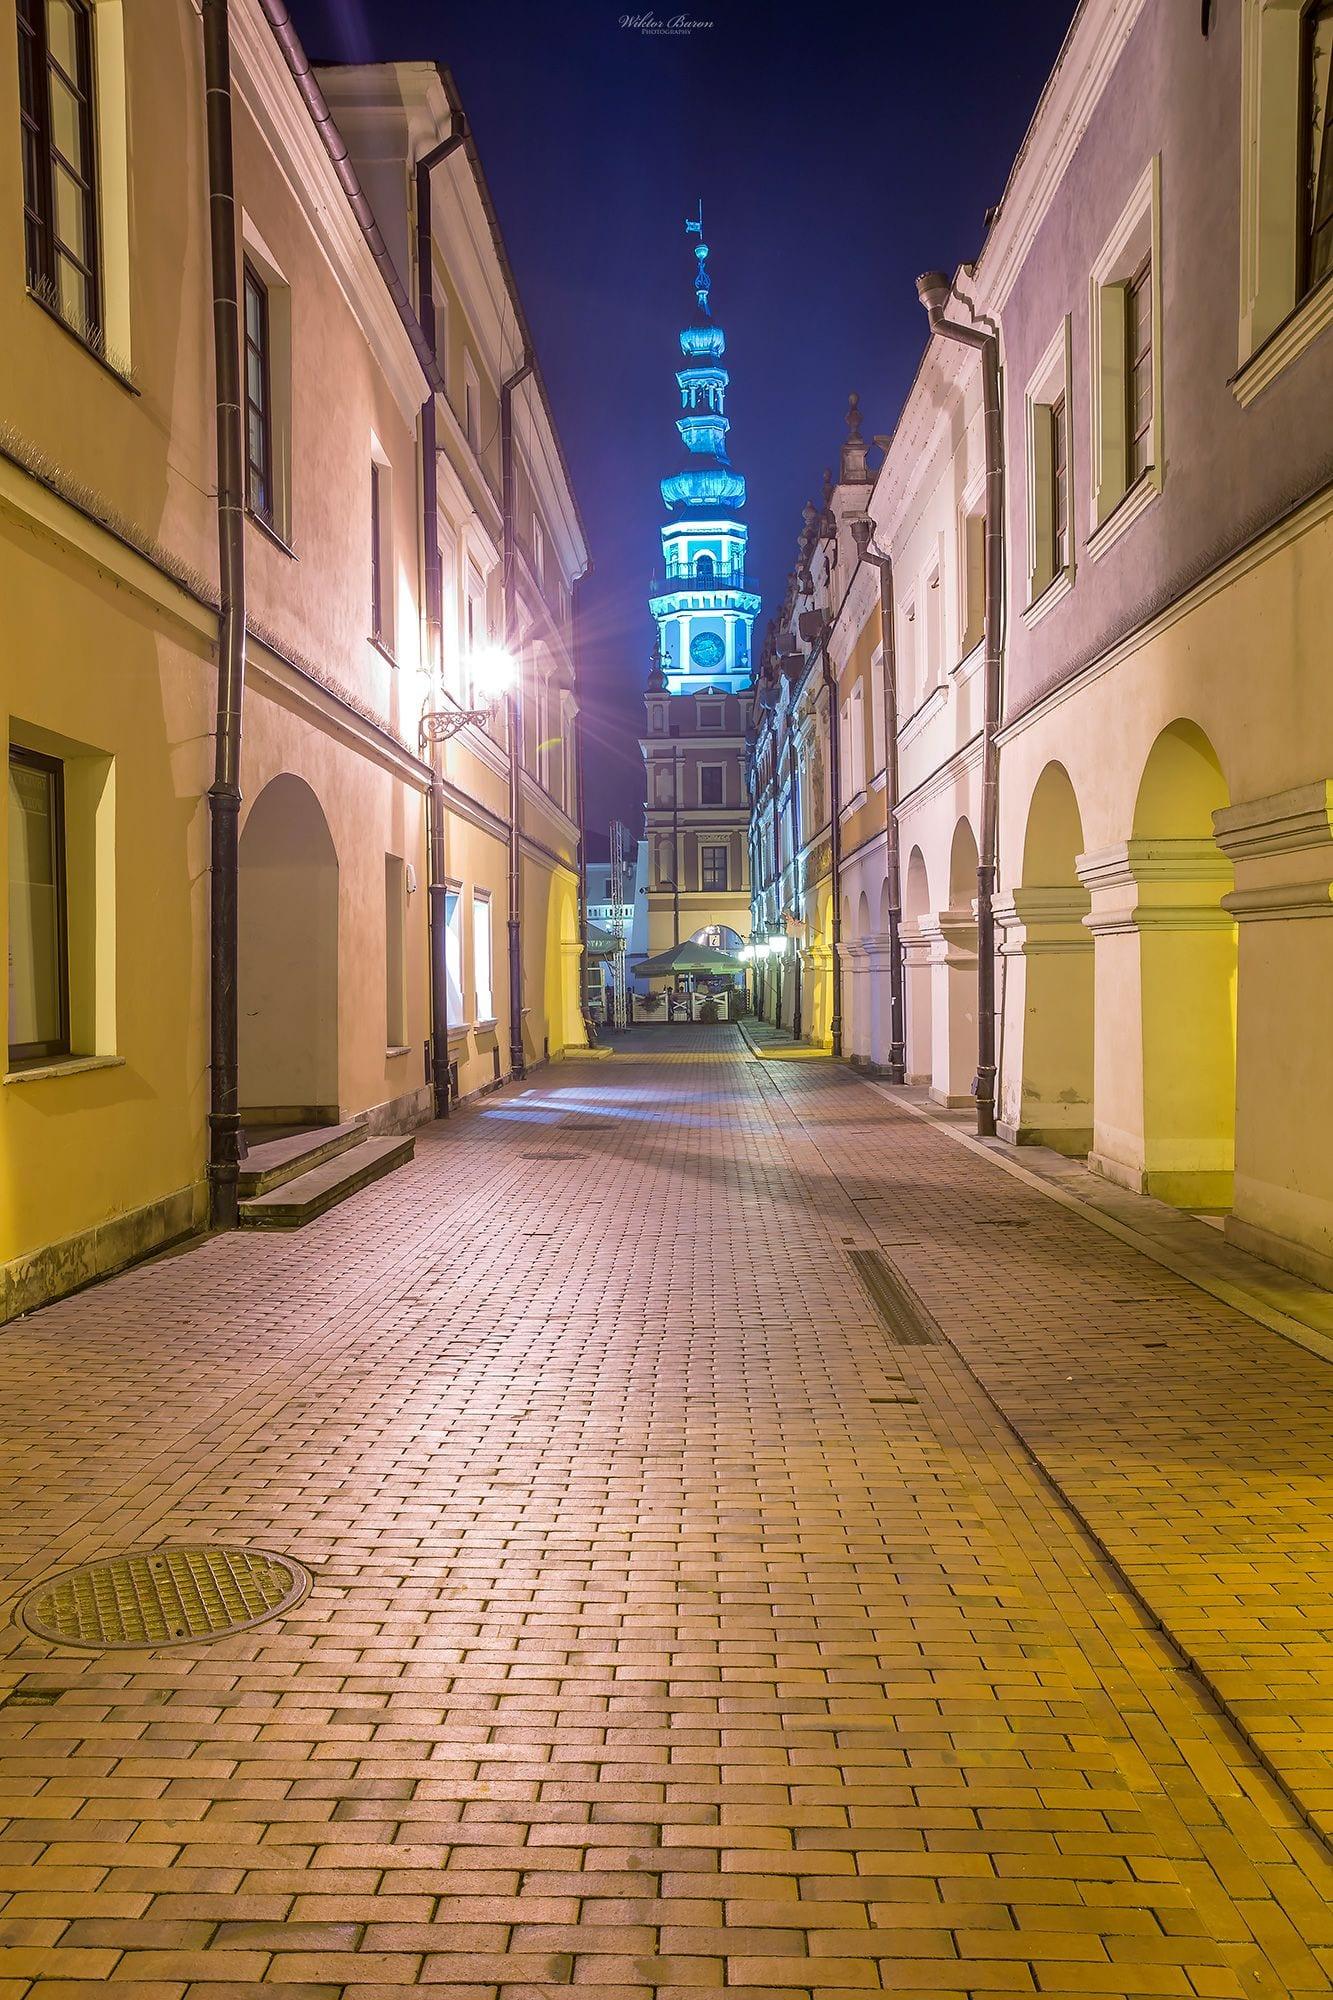 Ulica Ormiańska w Zamościu